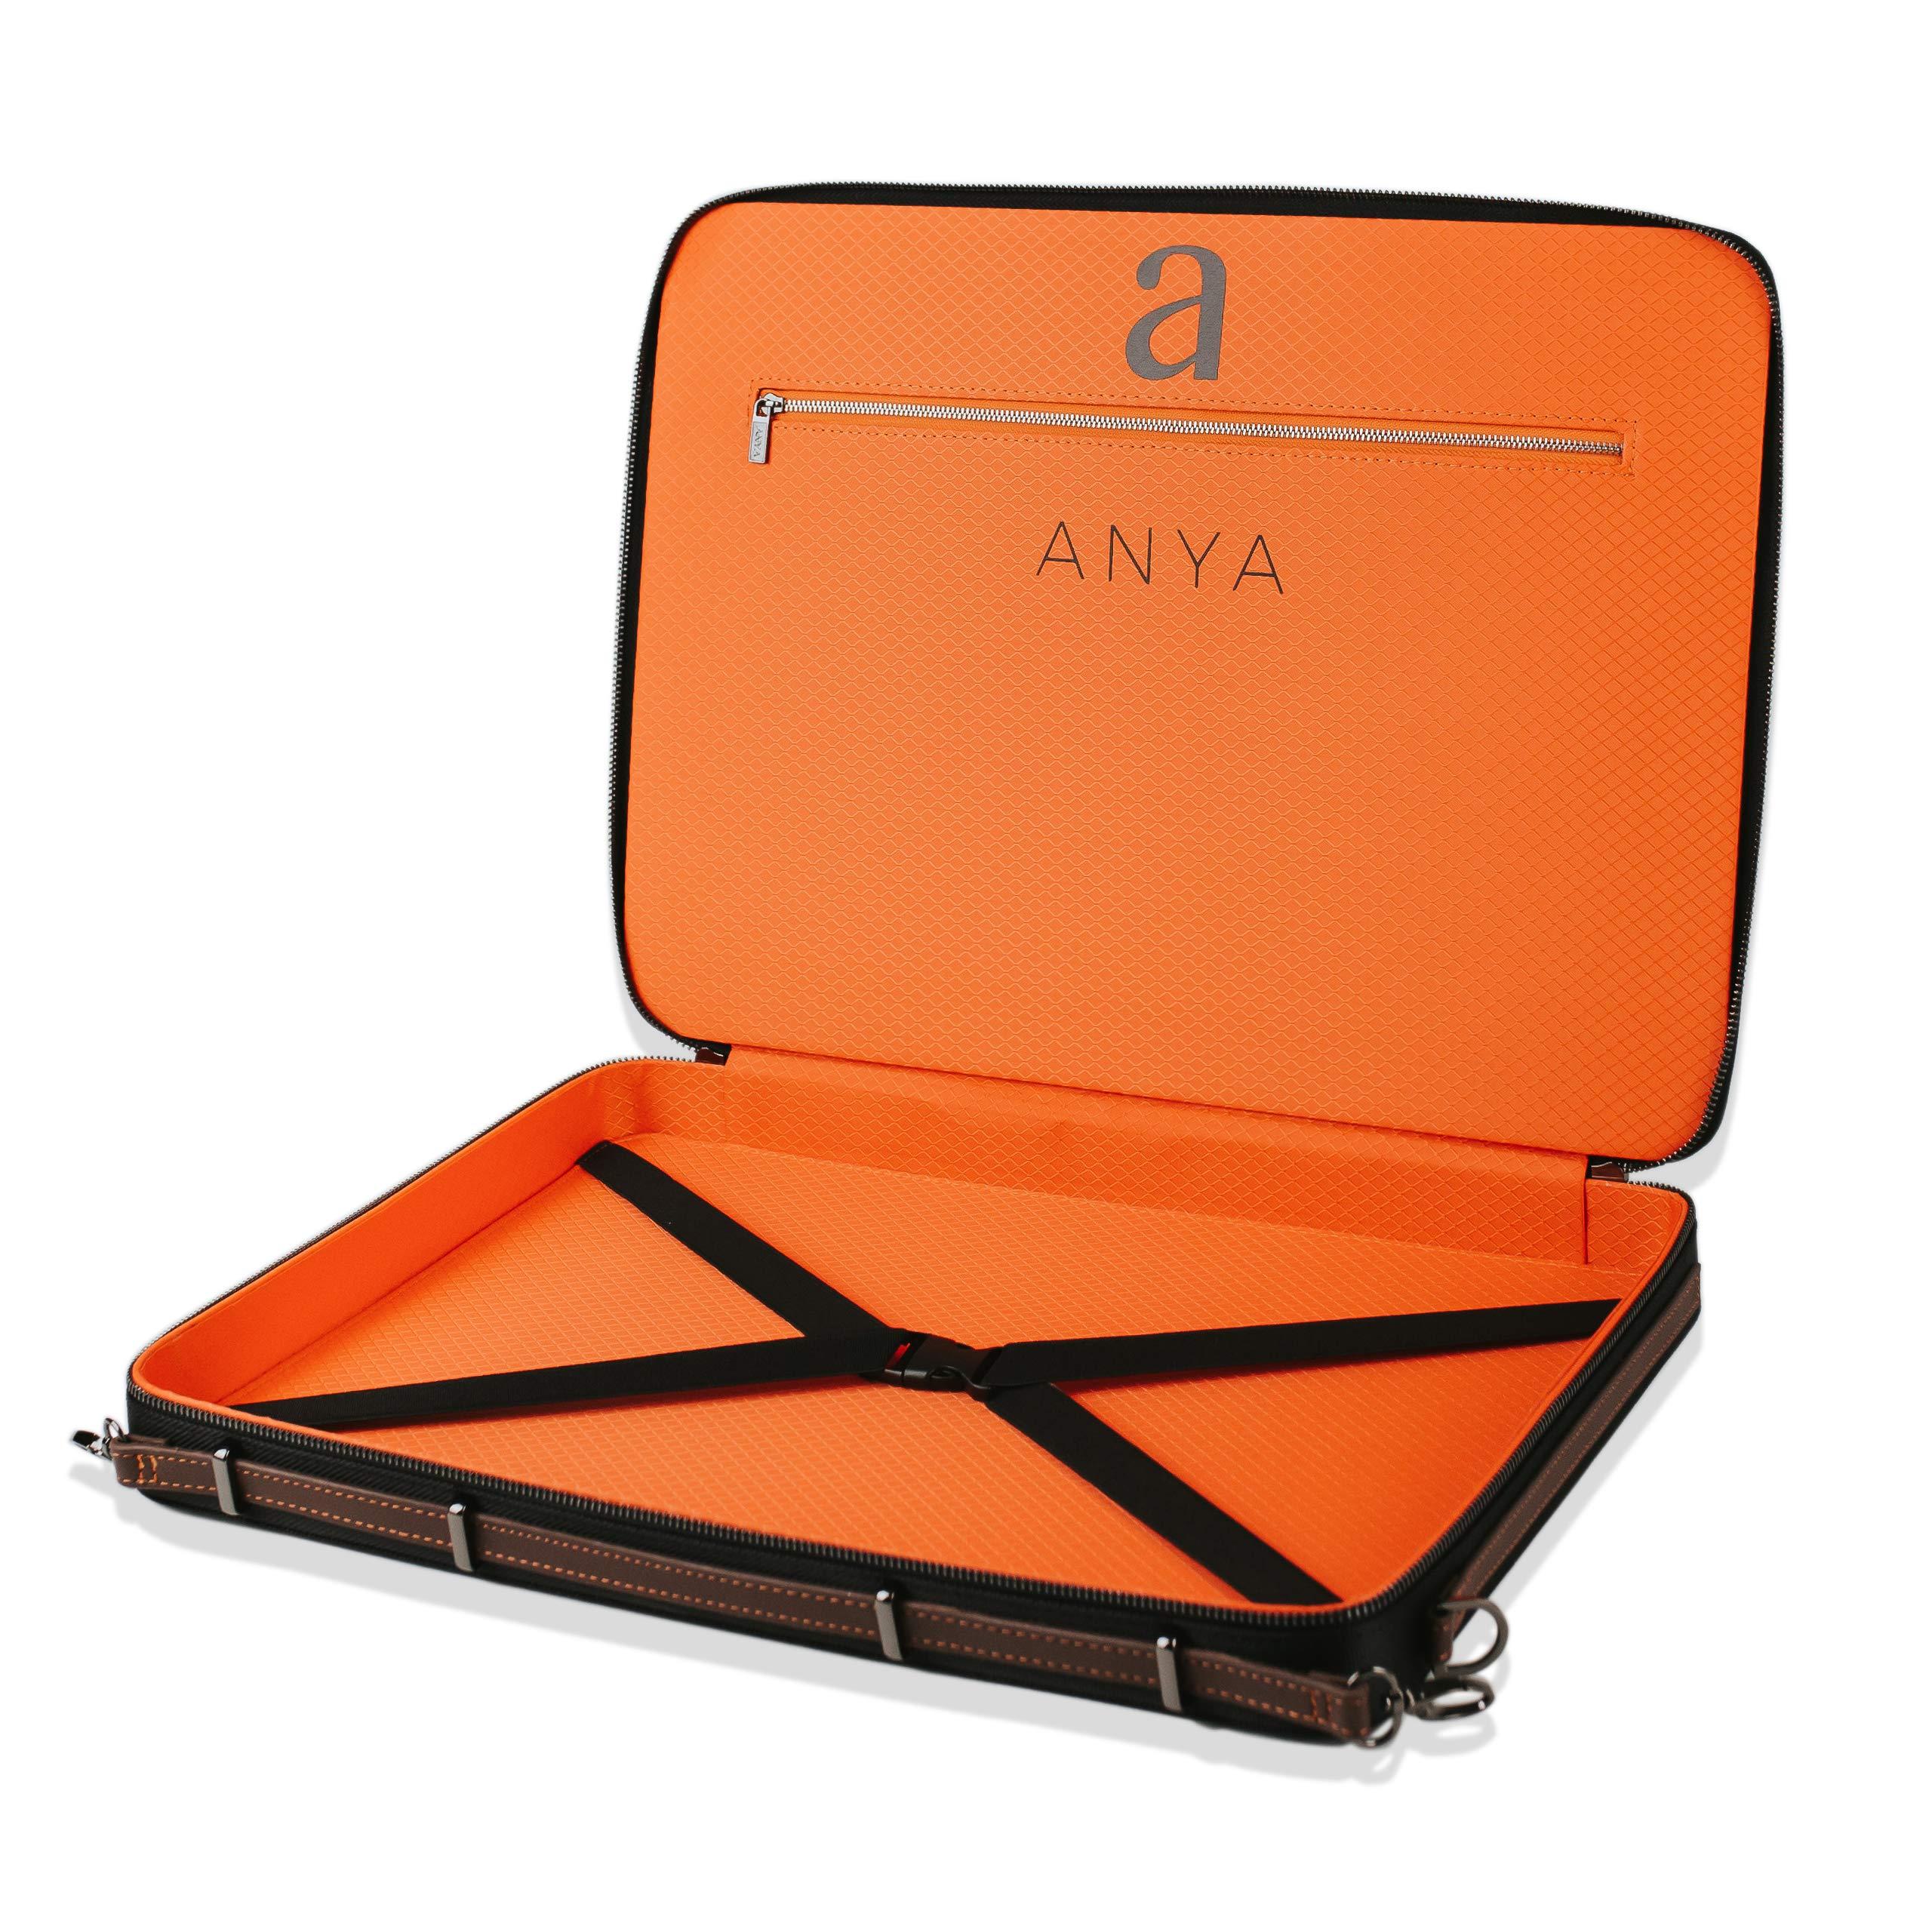 Anya Art Portfolio Case Carrying